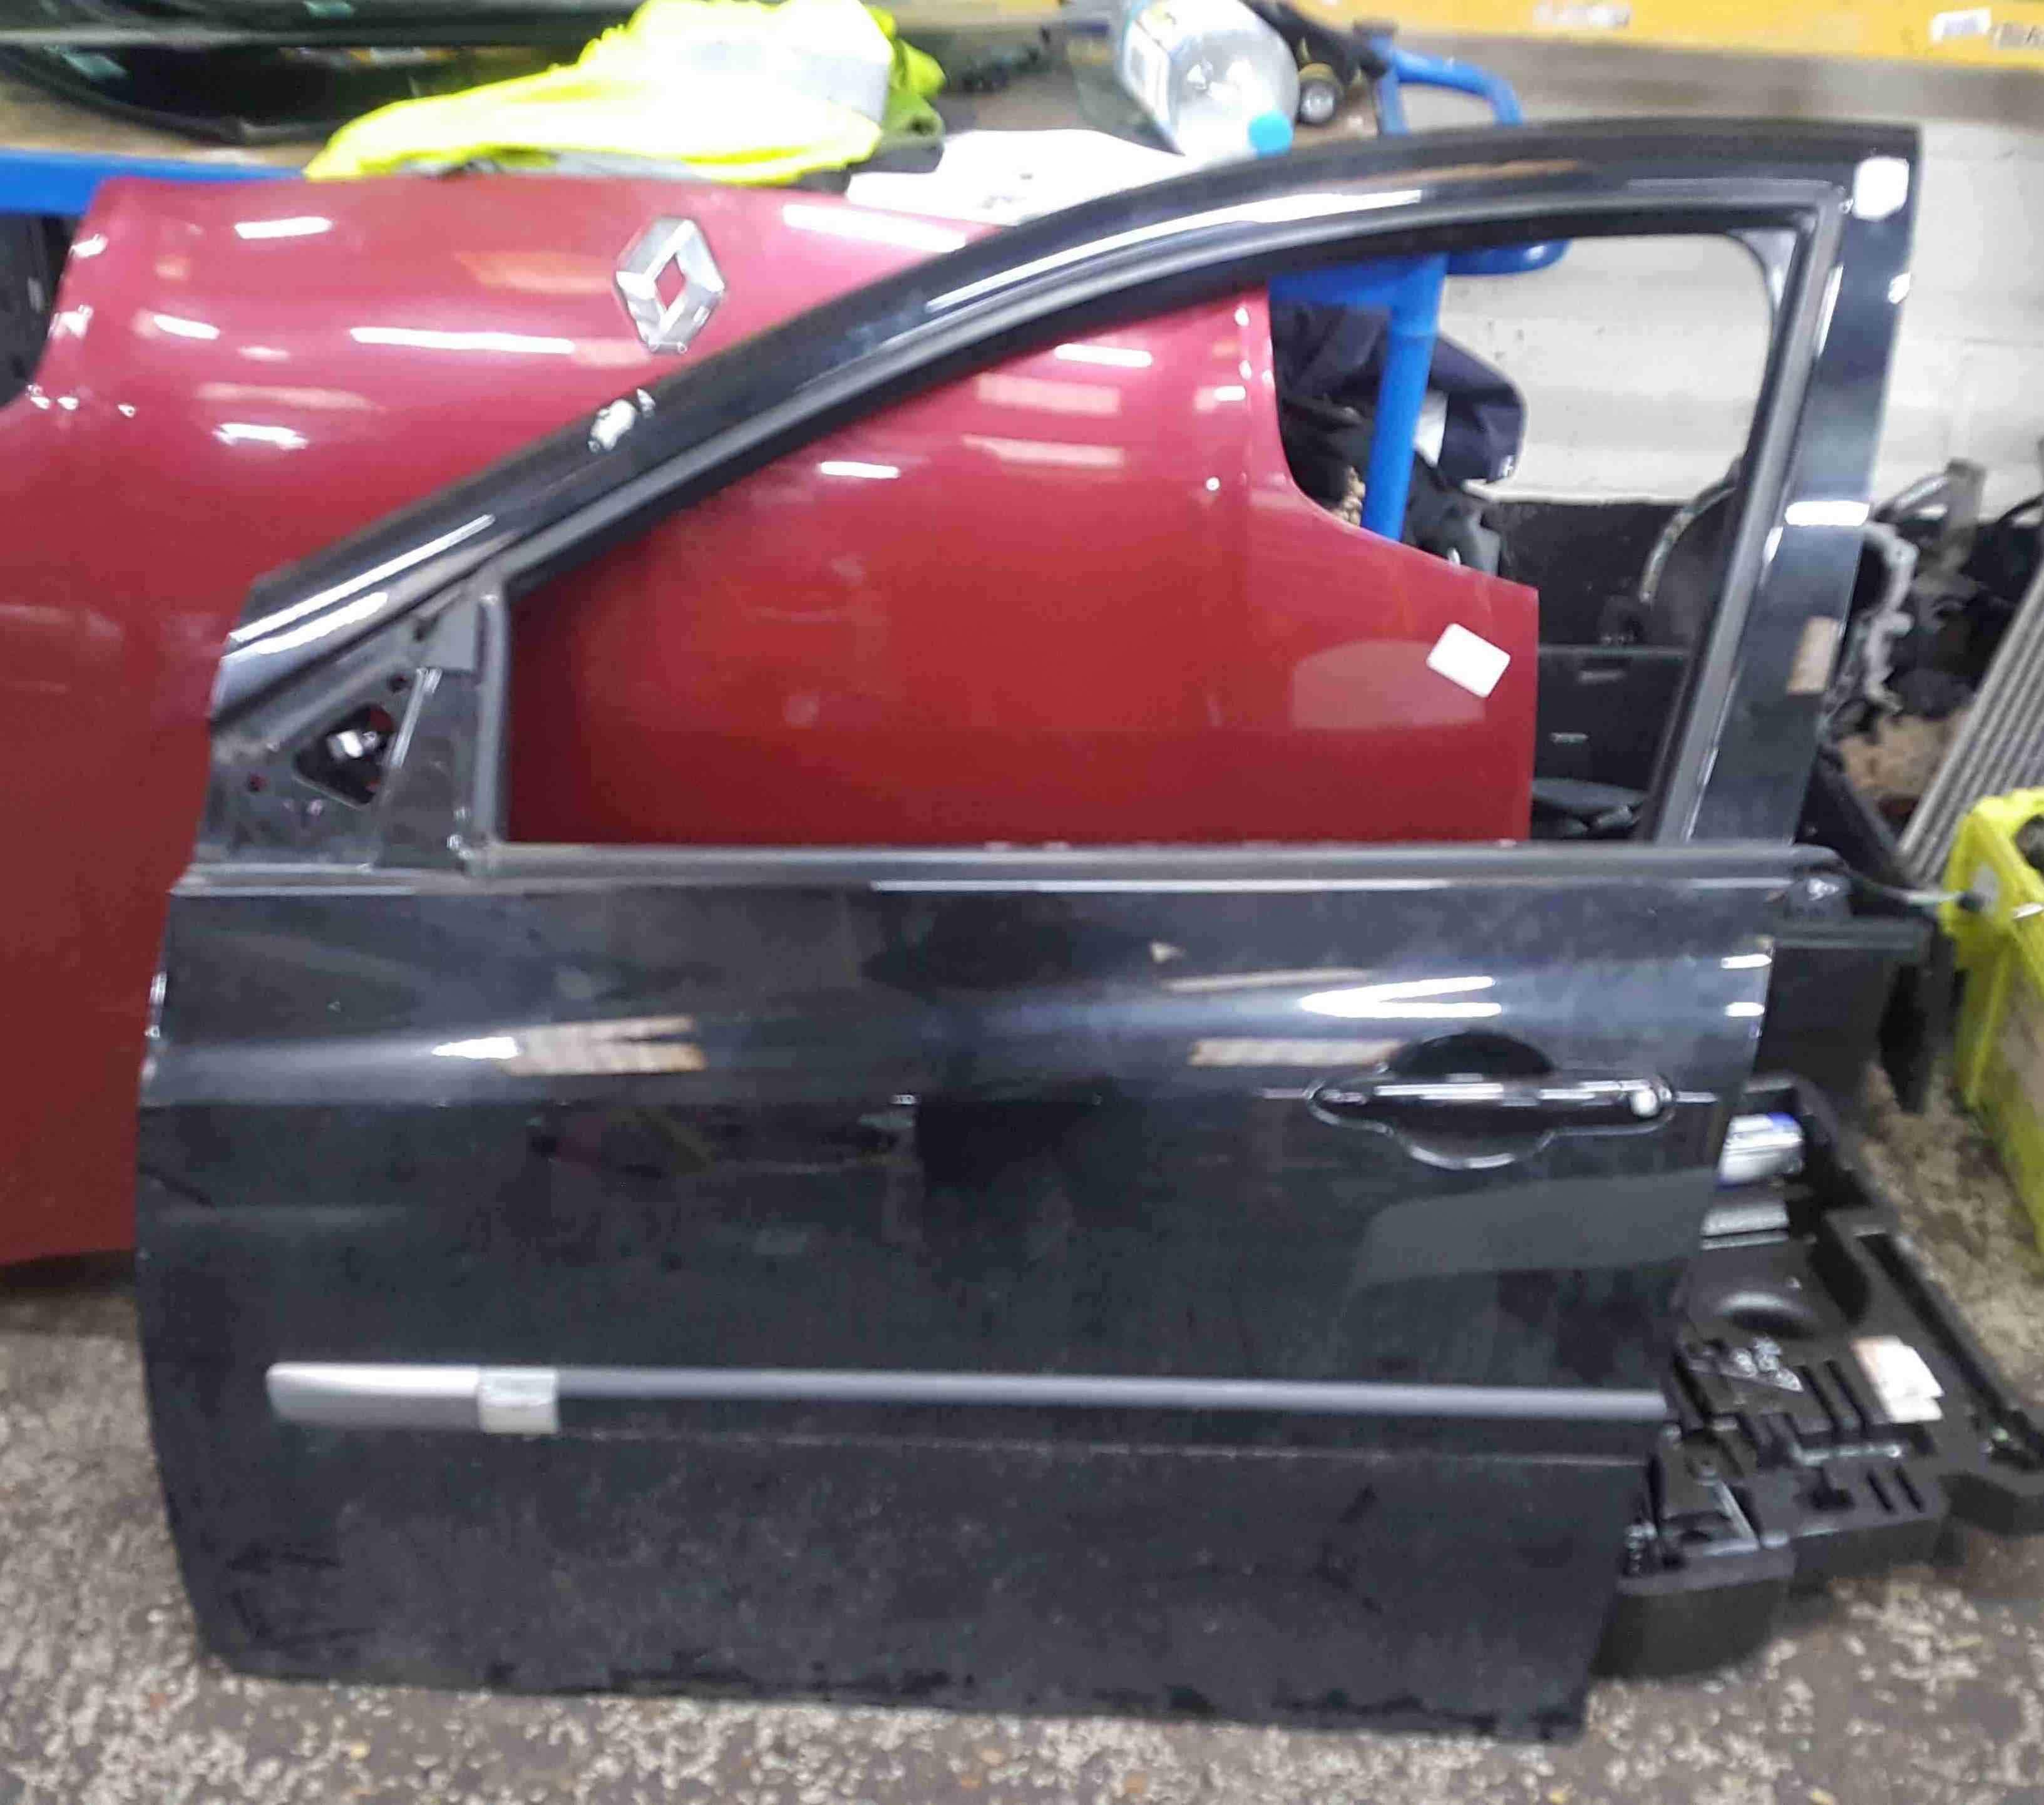 Renault Clio MK3 2005-2012 Passenger NSF Front Door Black TEGNE 5dr